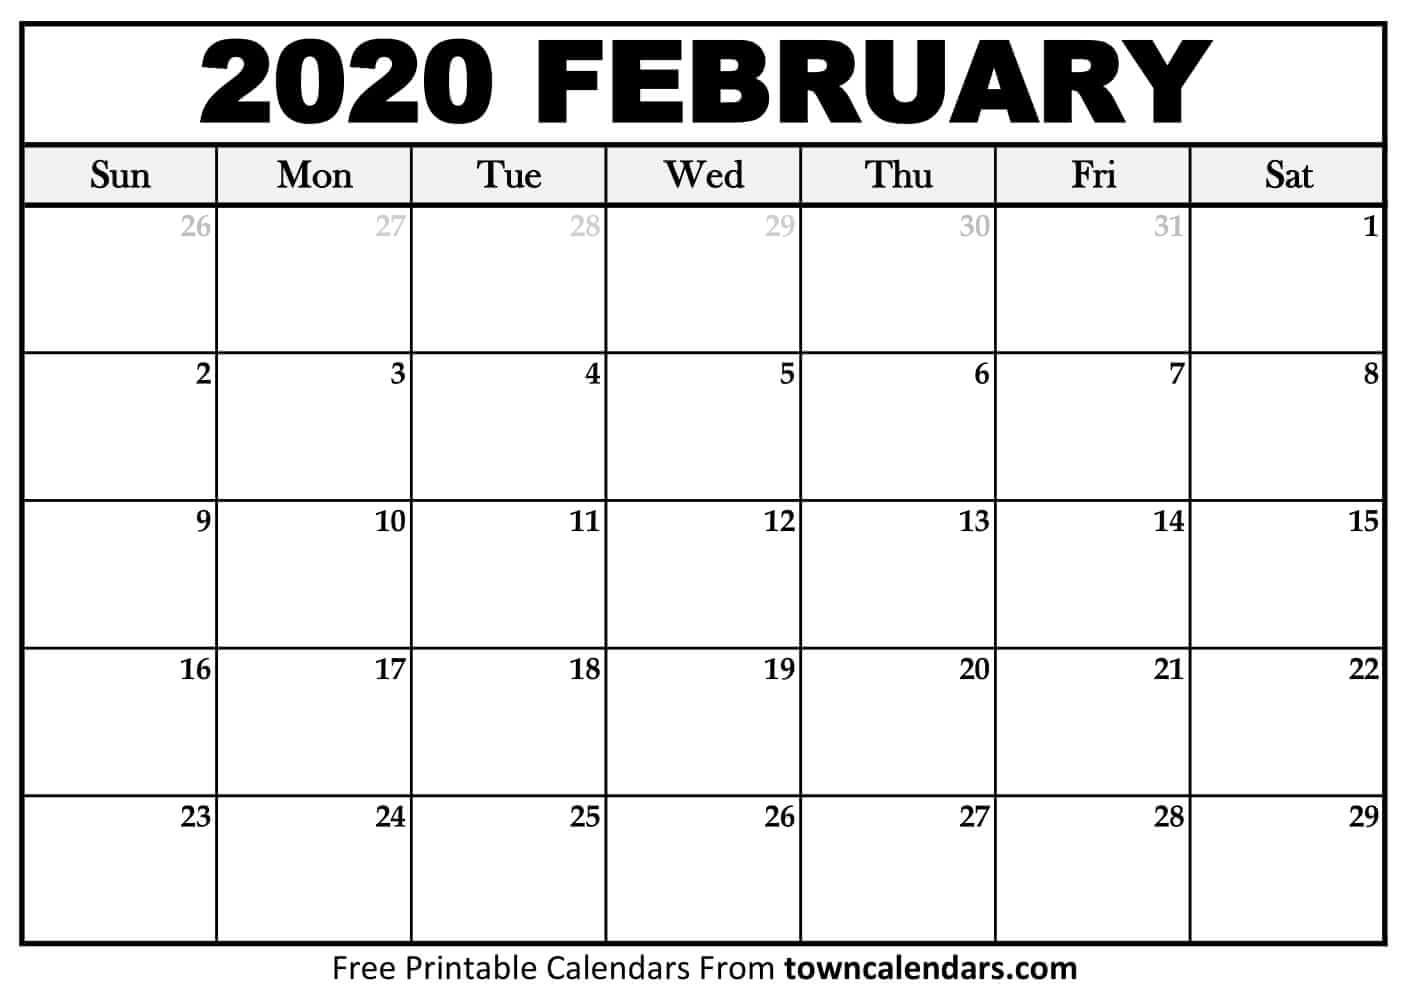 Printable February 2020 Calendar - Towncalendars  Feb 2020 Calendar